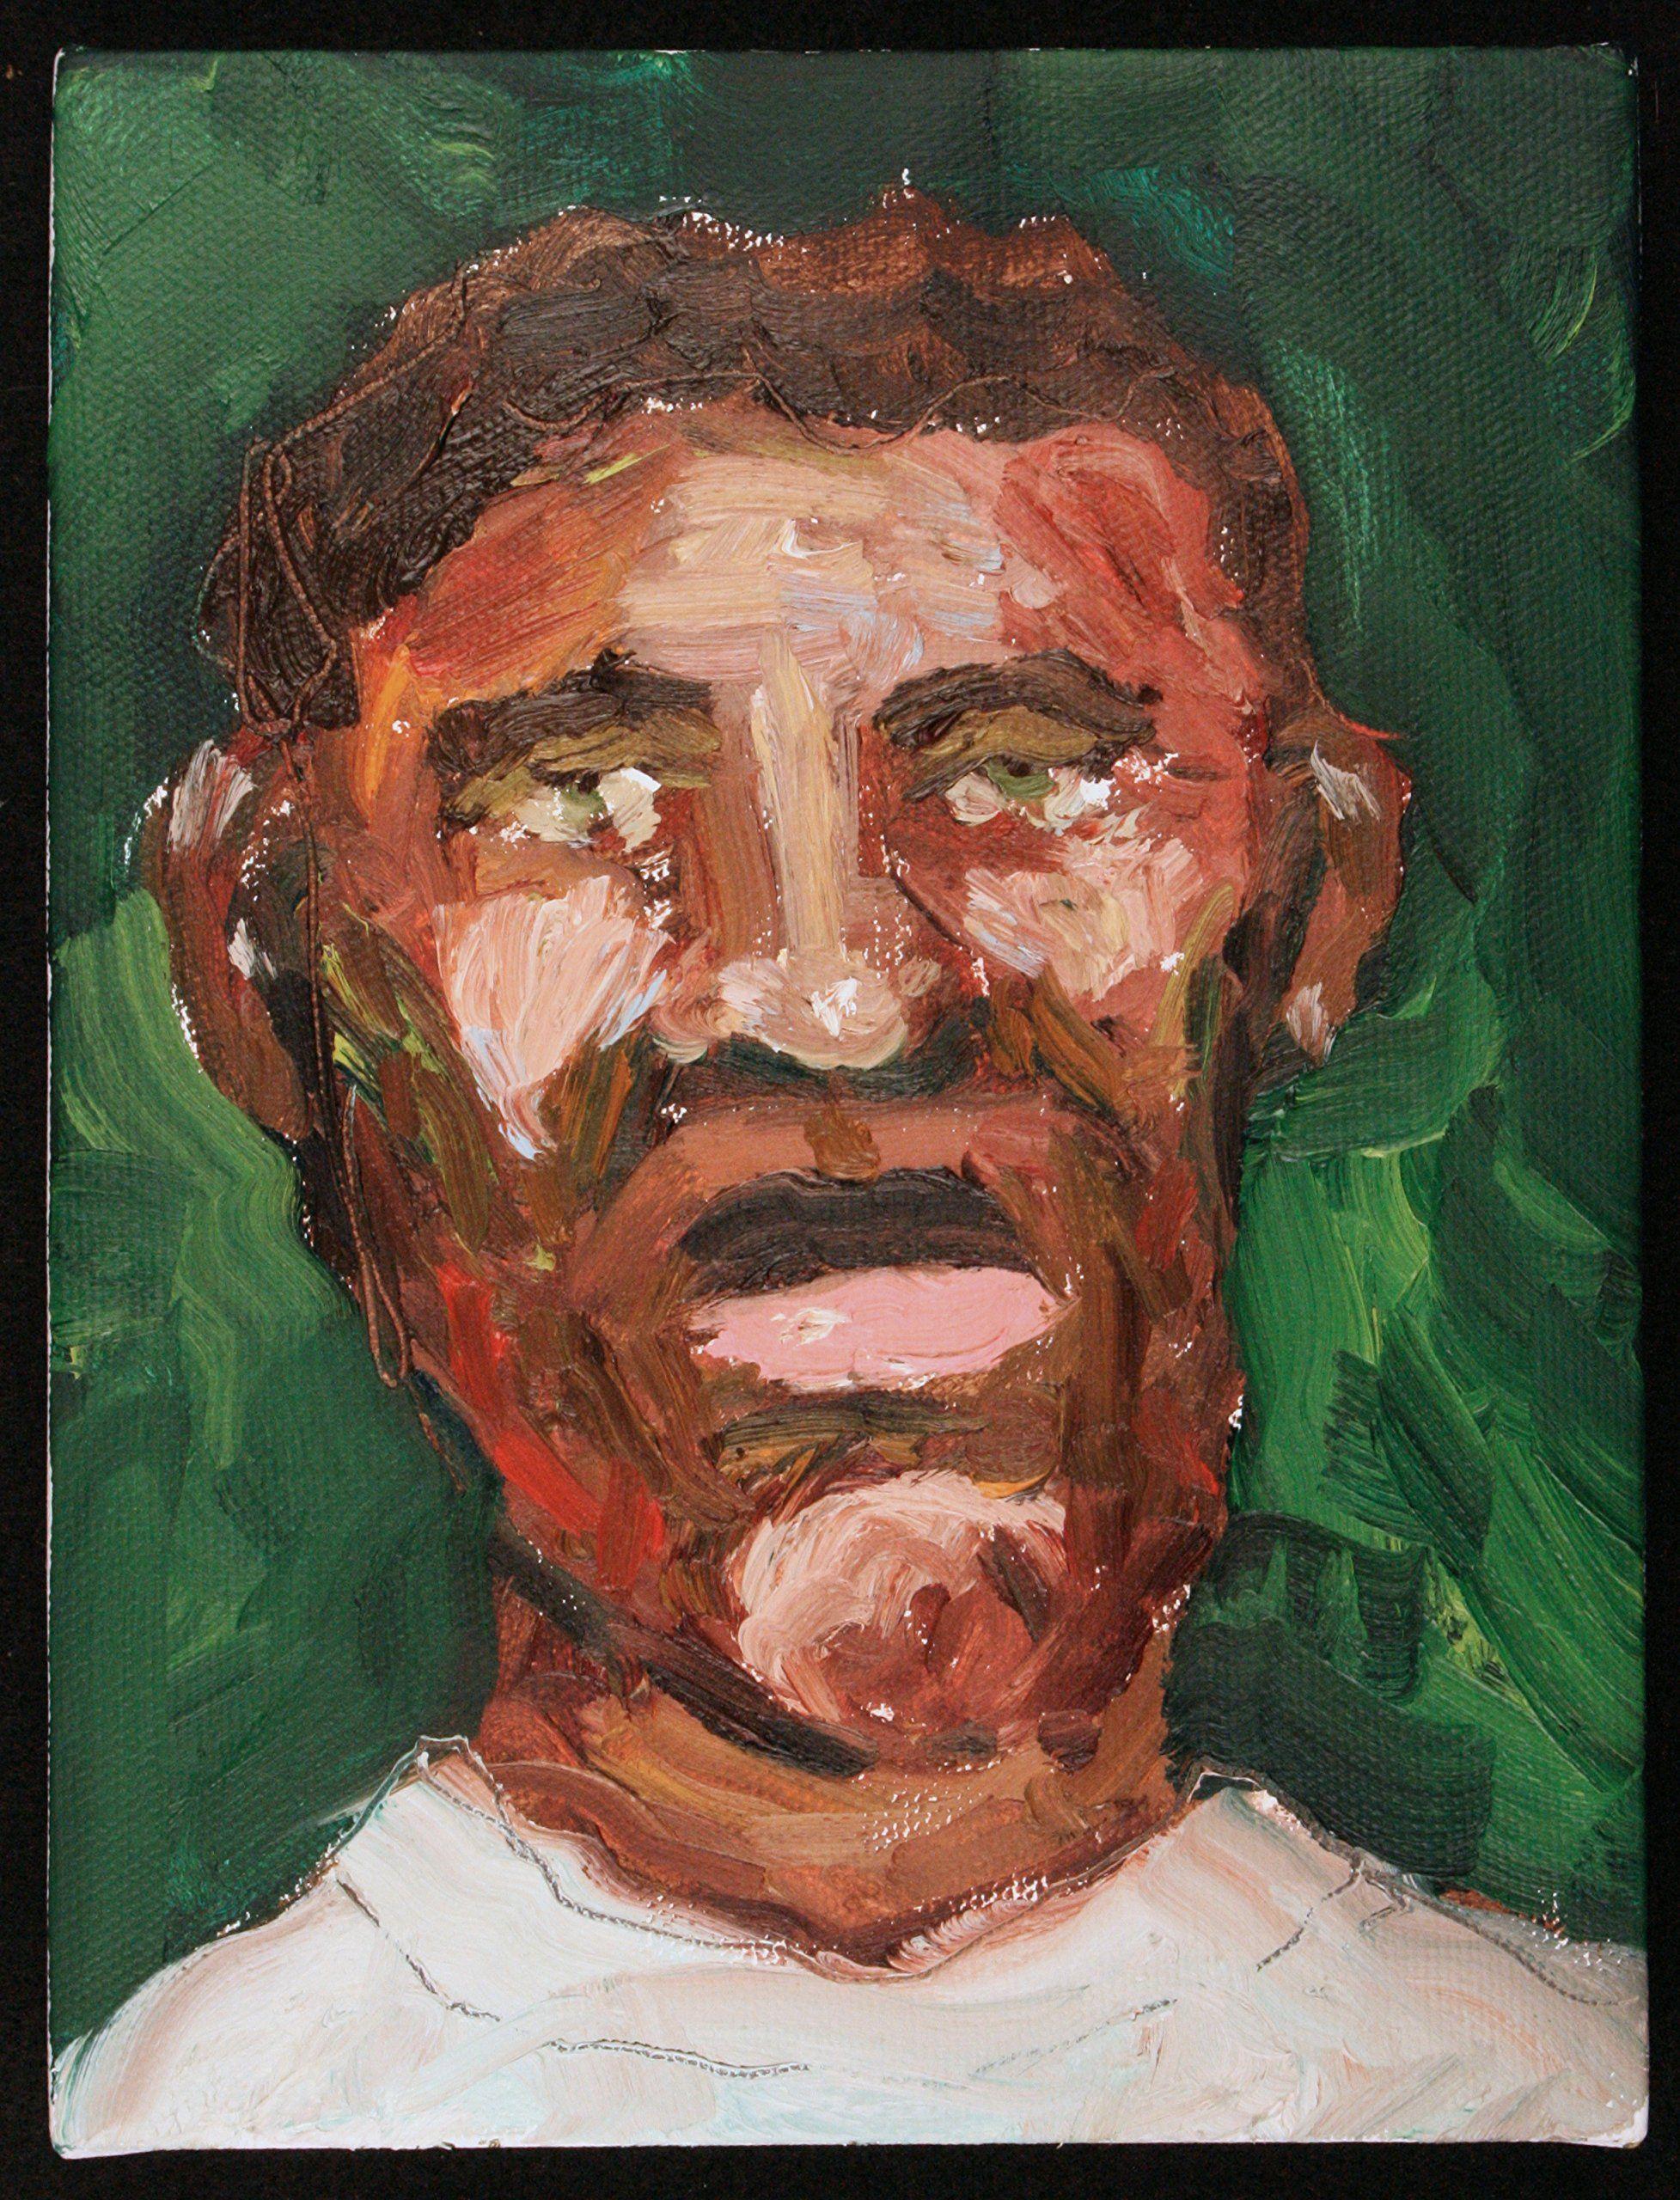 Terrance Painting, Zatista, Stream of consciousness